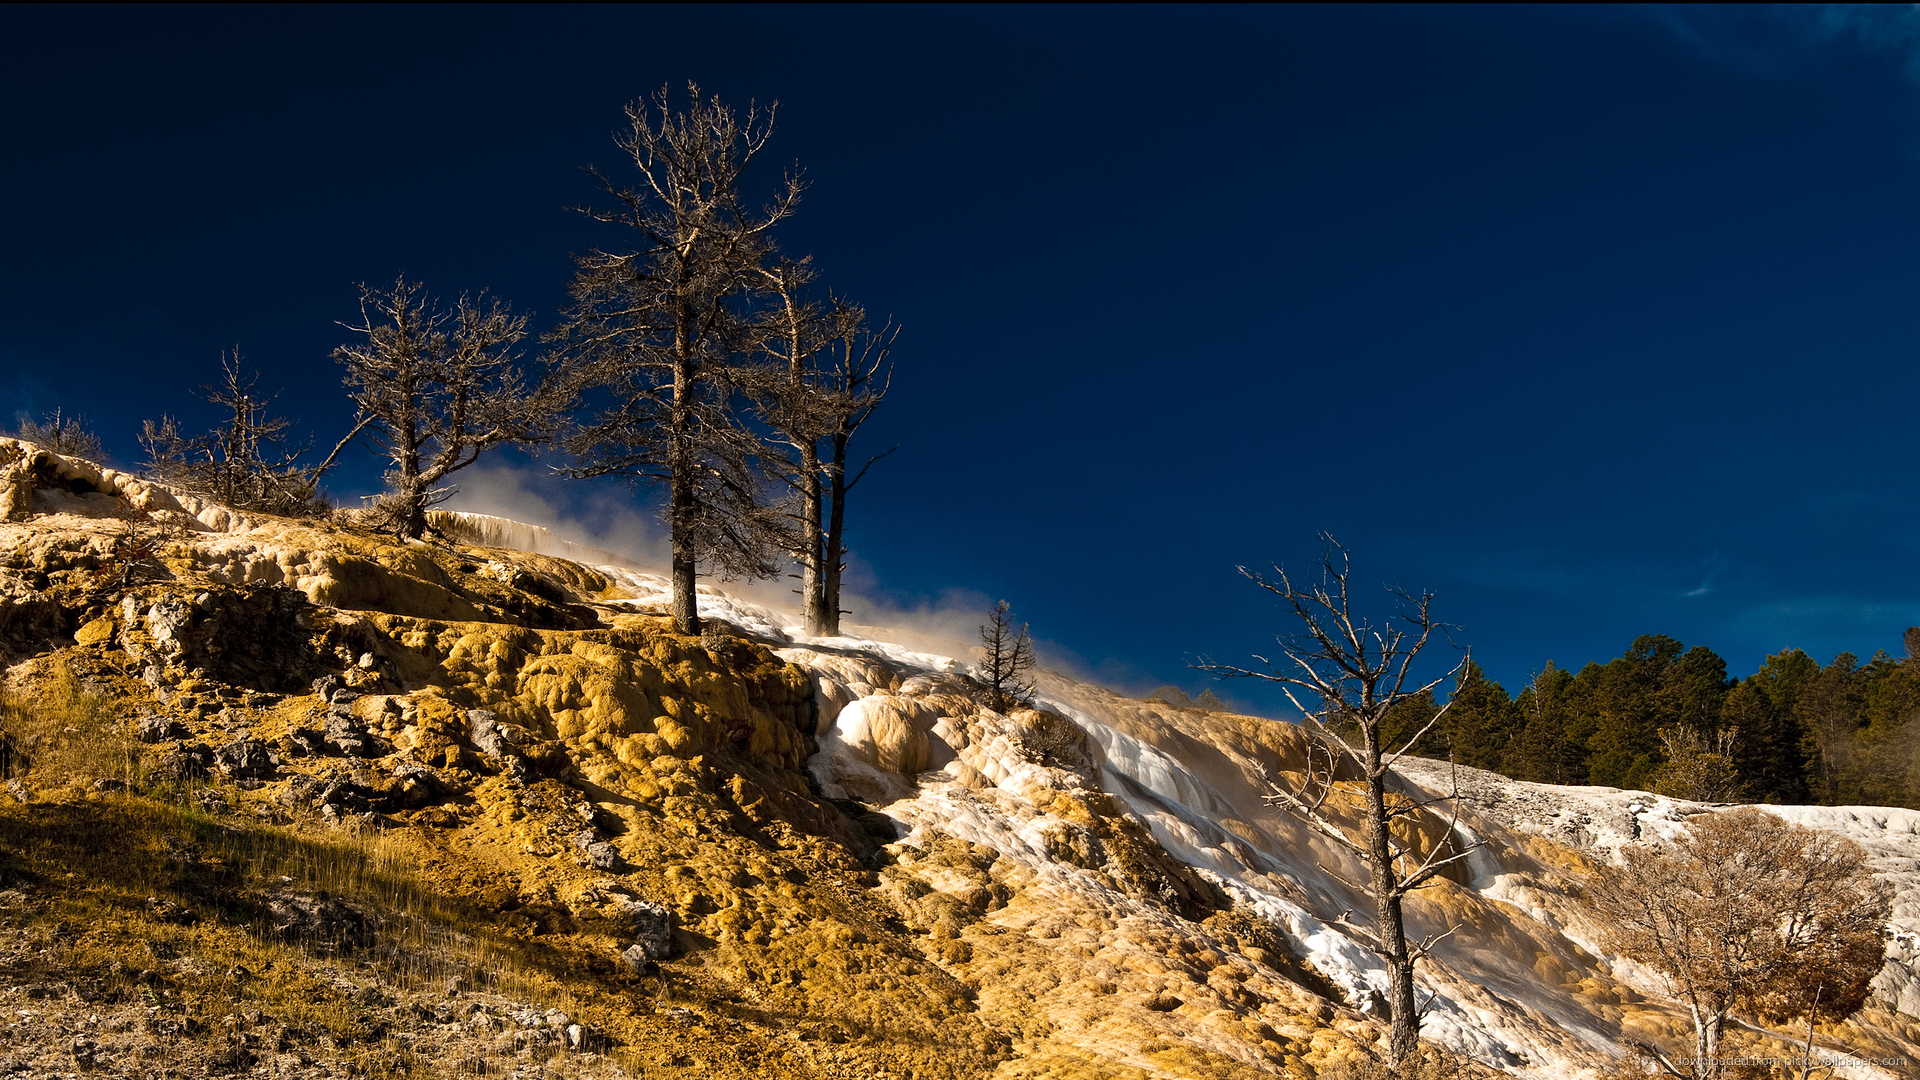 yellowstone national park hd - photo #19